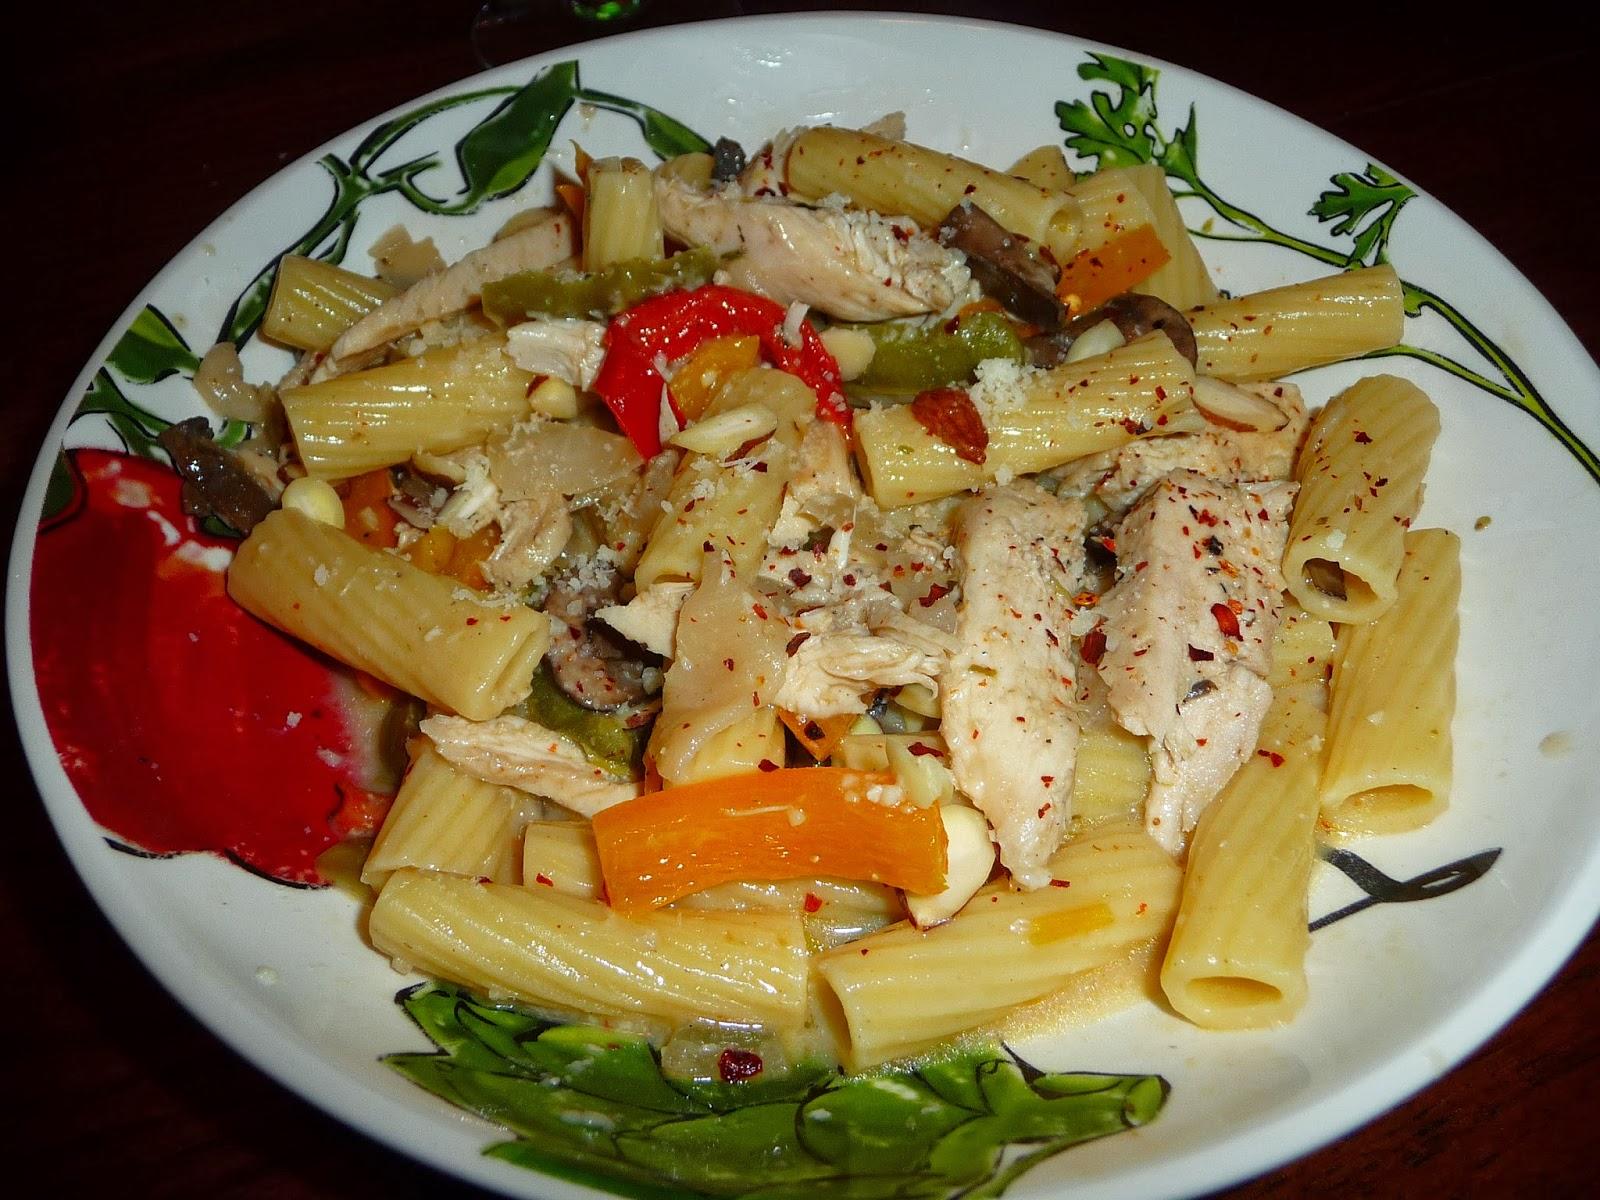 Live Love Eat Chicken Pasta Primavera In A White Wine Garlic Cream Sauce